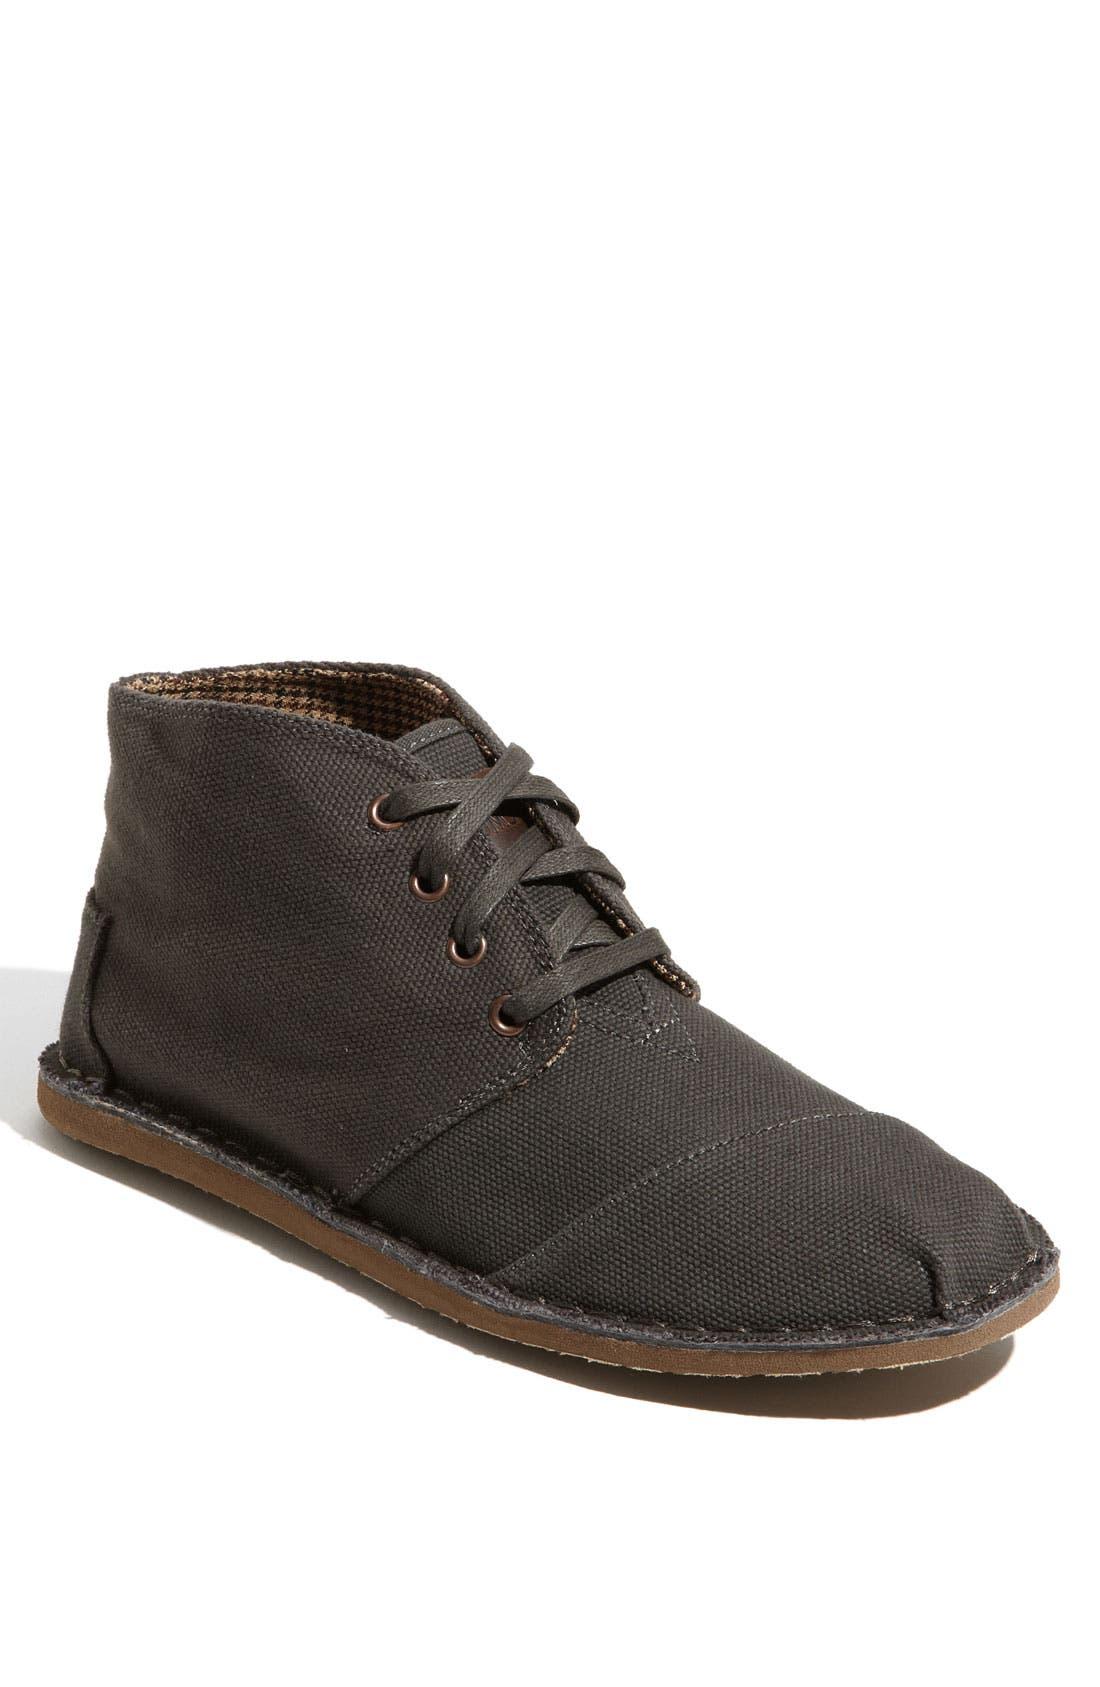 Main Image - TOMS 'Botas - Desert' Chukka Boot (Men)